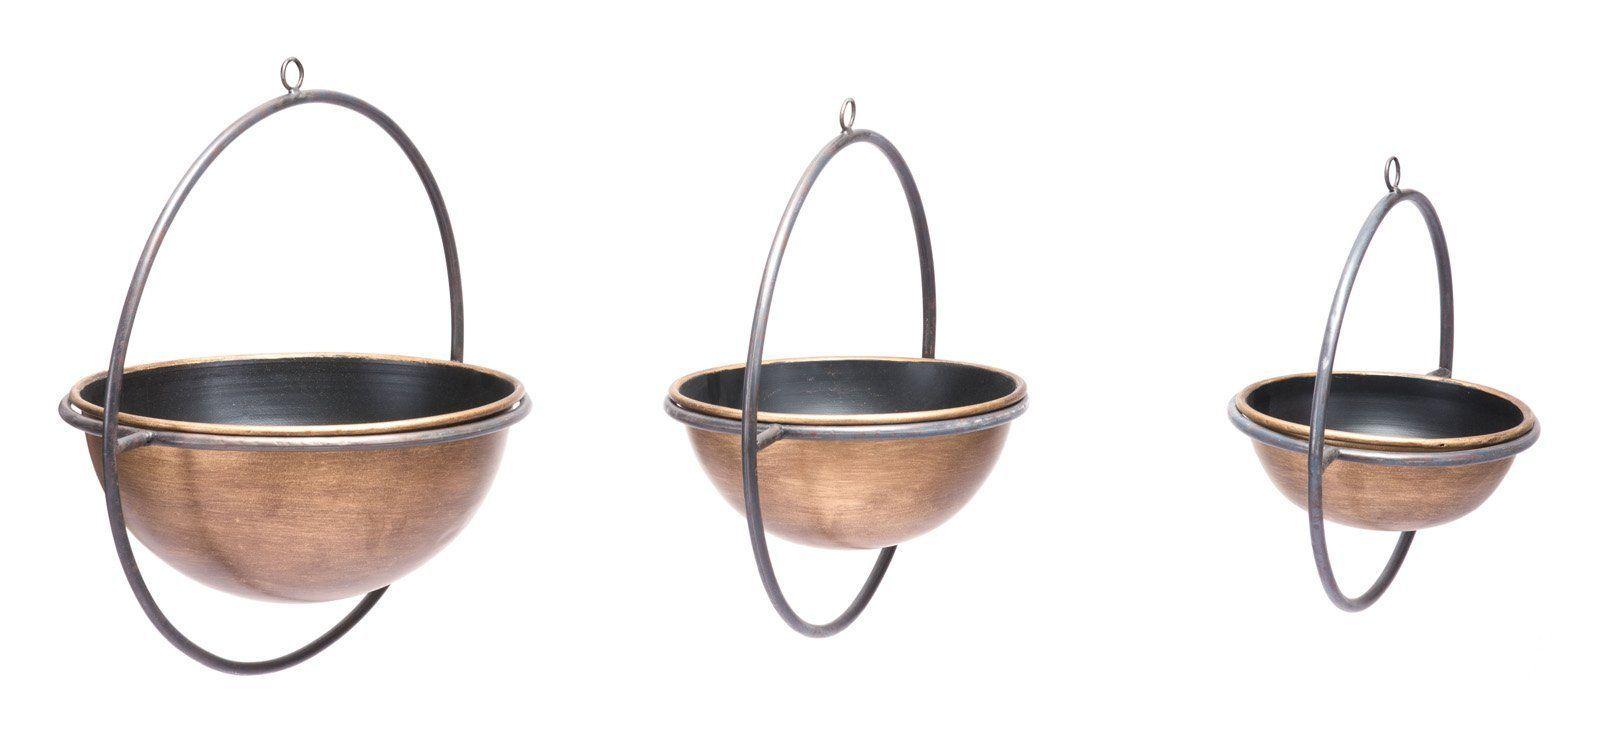 Set of 3 metal vases antique products set of 3 metal vases antique reviewsmspy